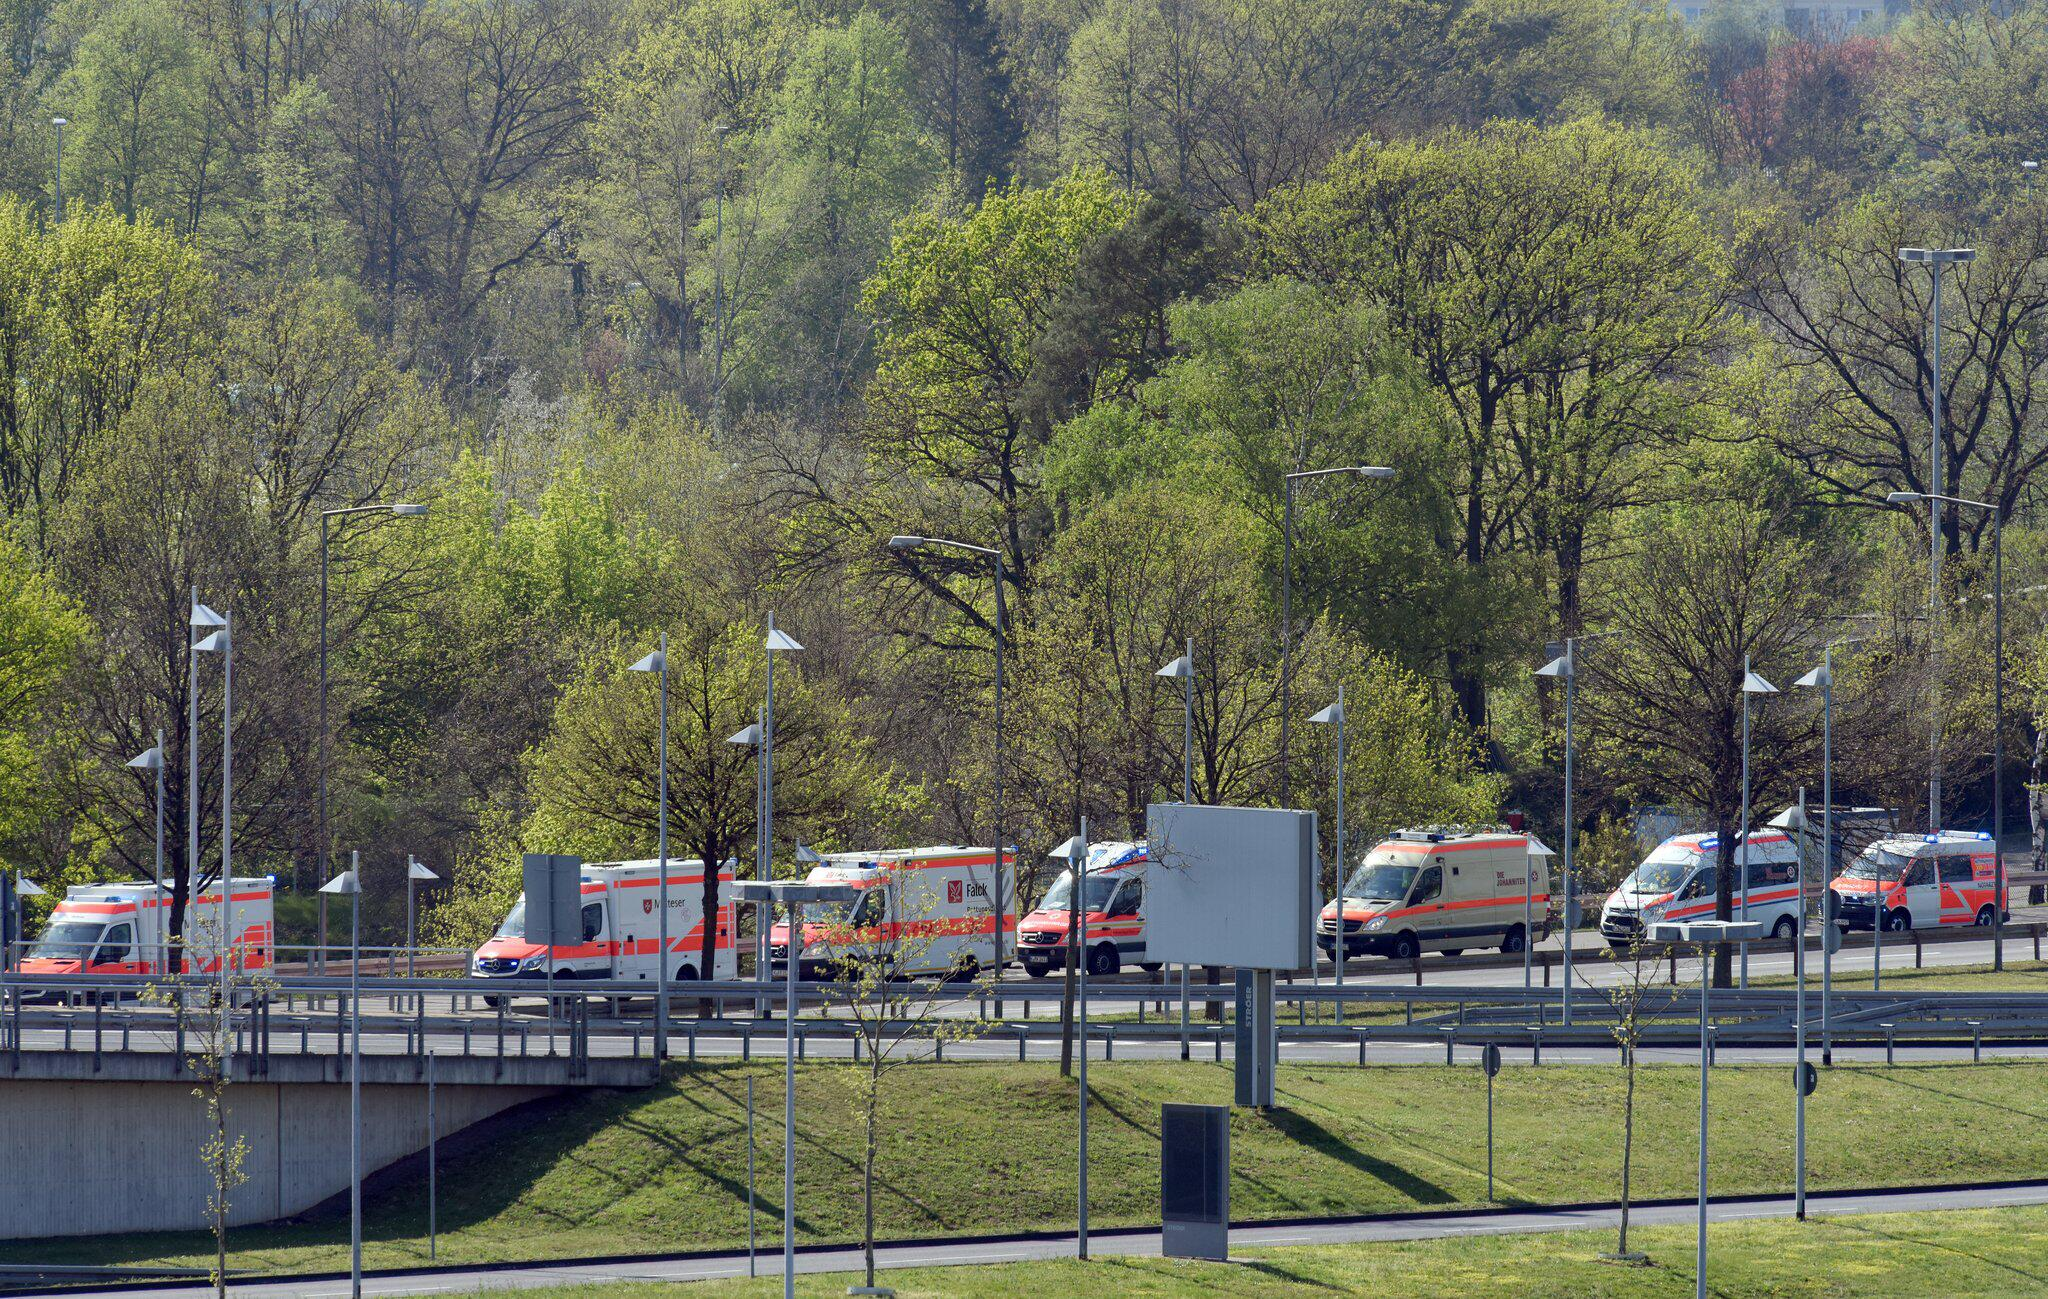 Bild zu Nach dem Busunglück auf Madeira - Rücktransport der Verletzten